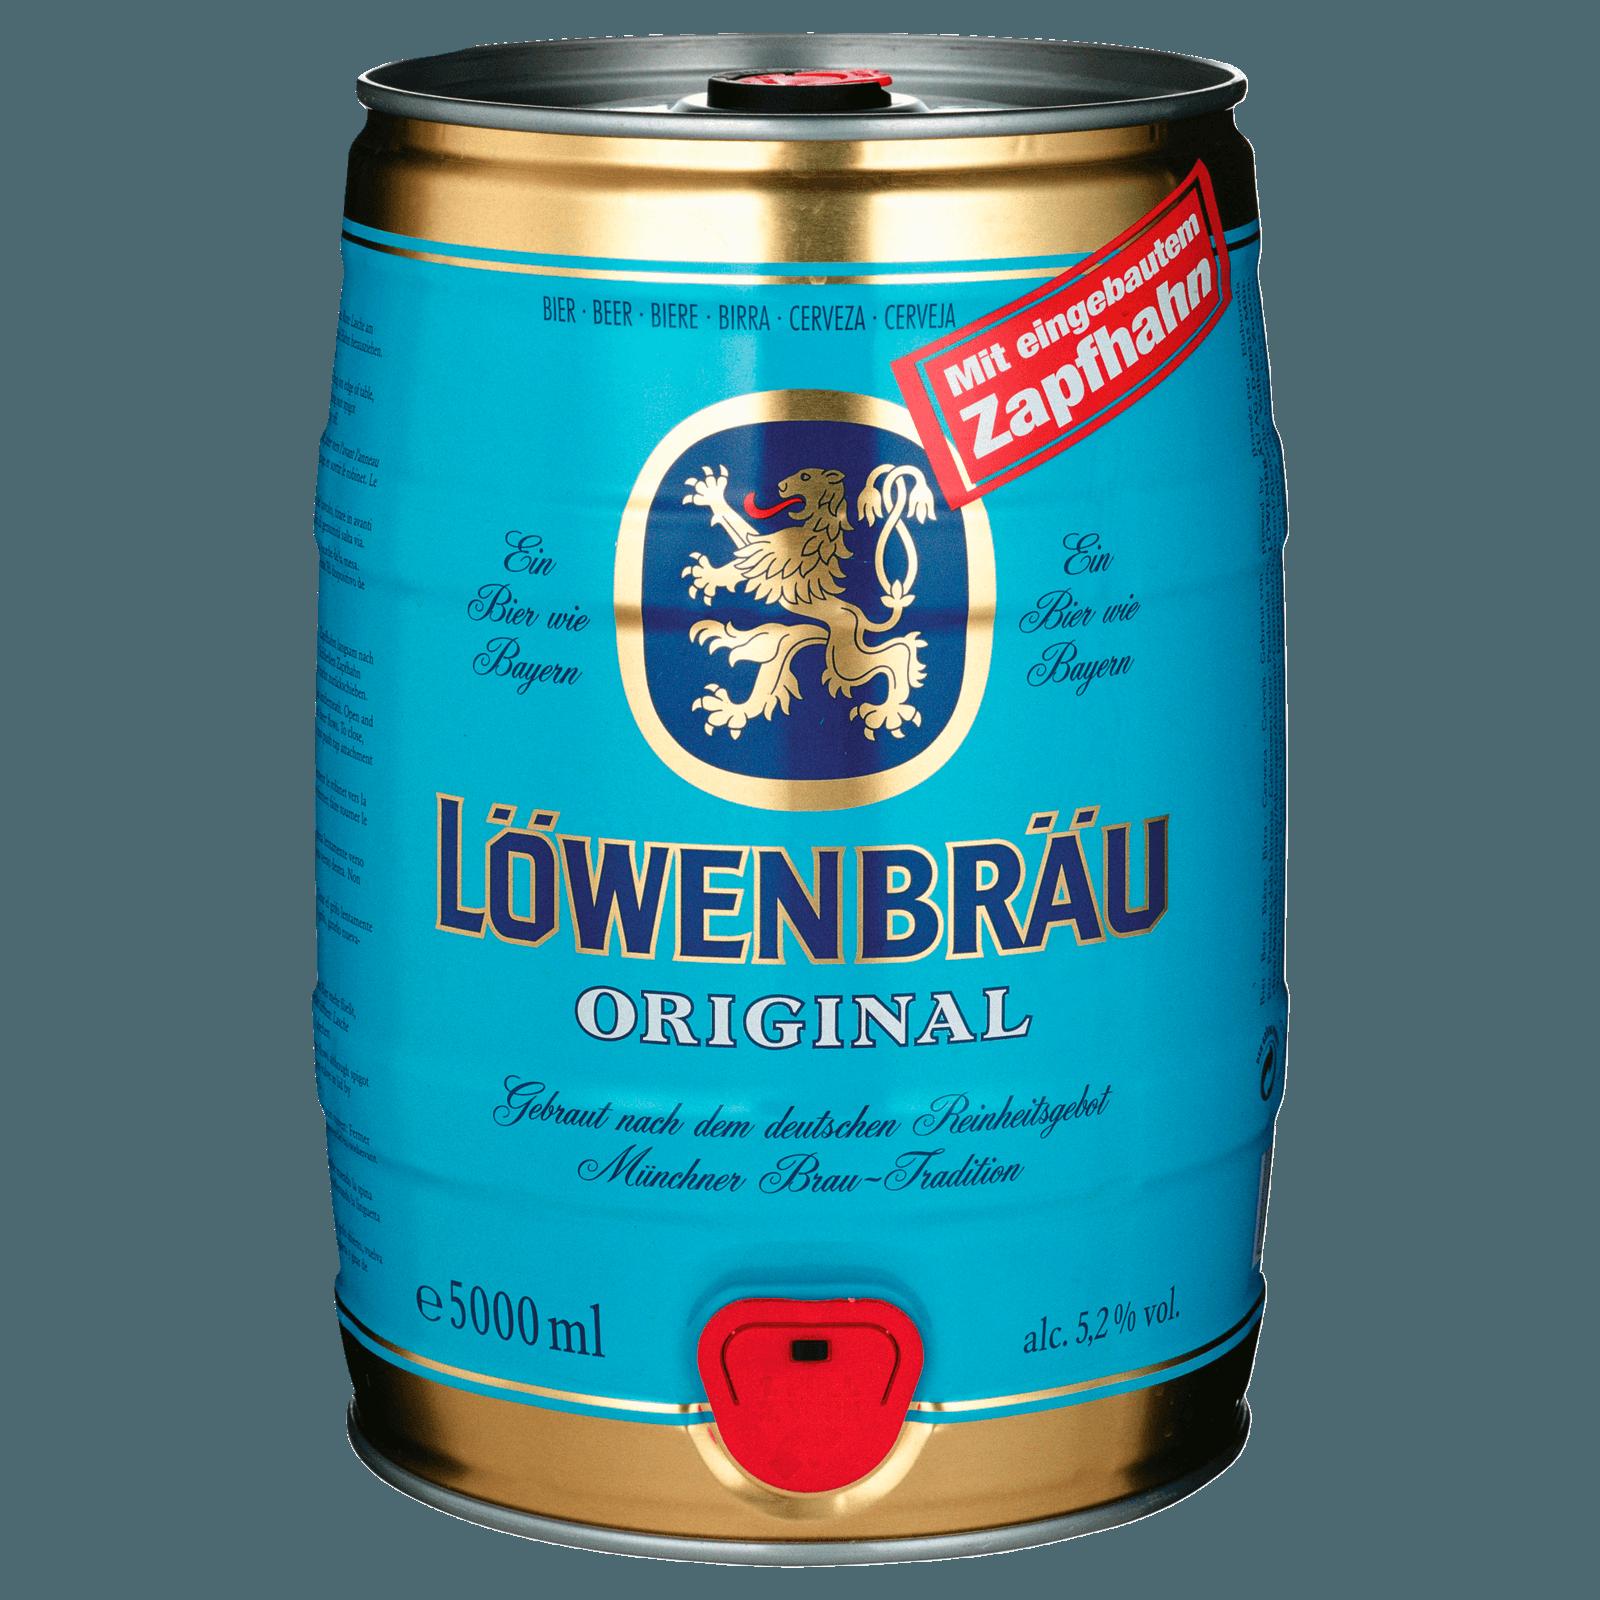 Löwenbräu Original Fass 5l bei REWE online bestellen!